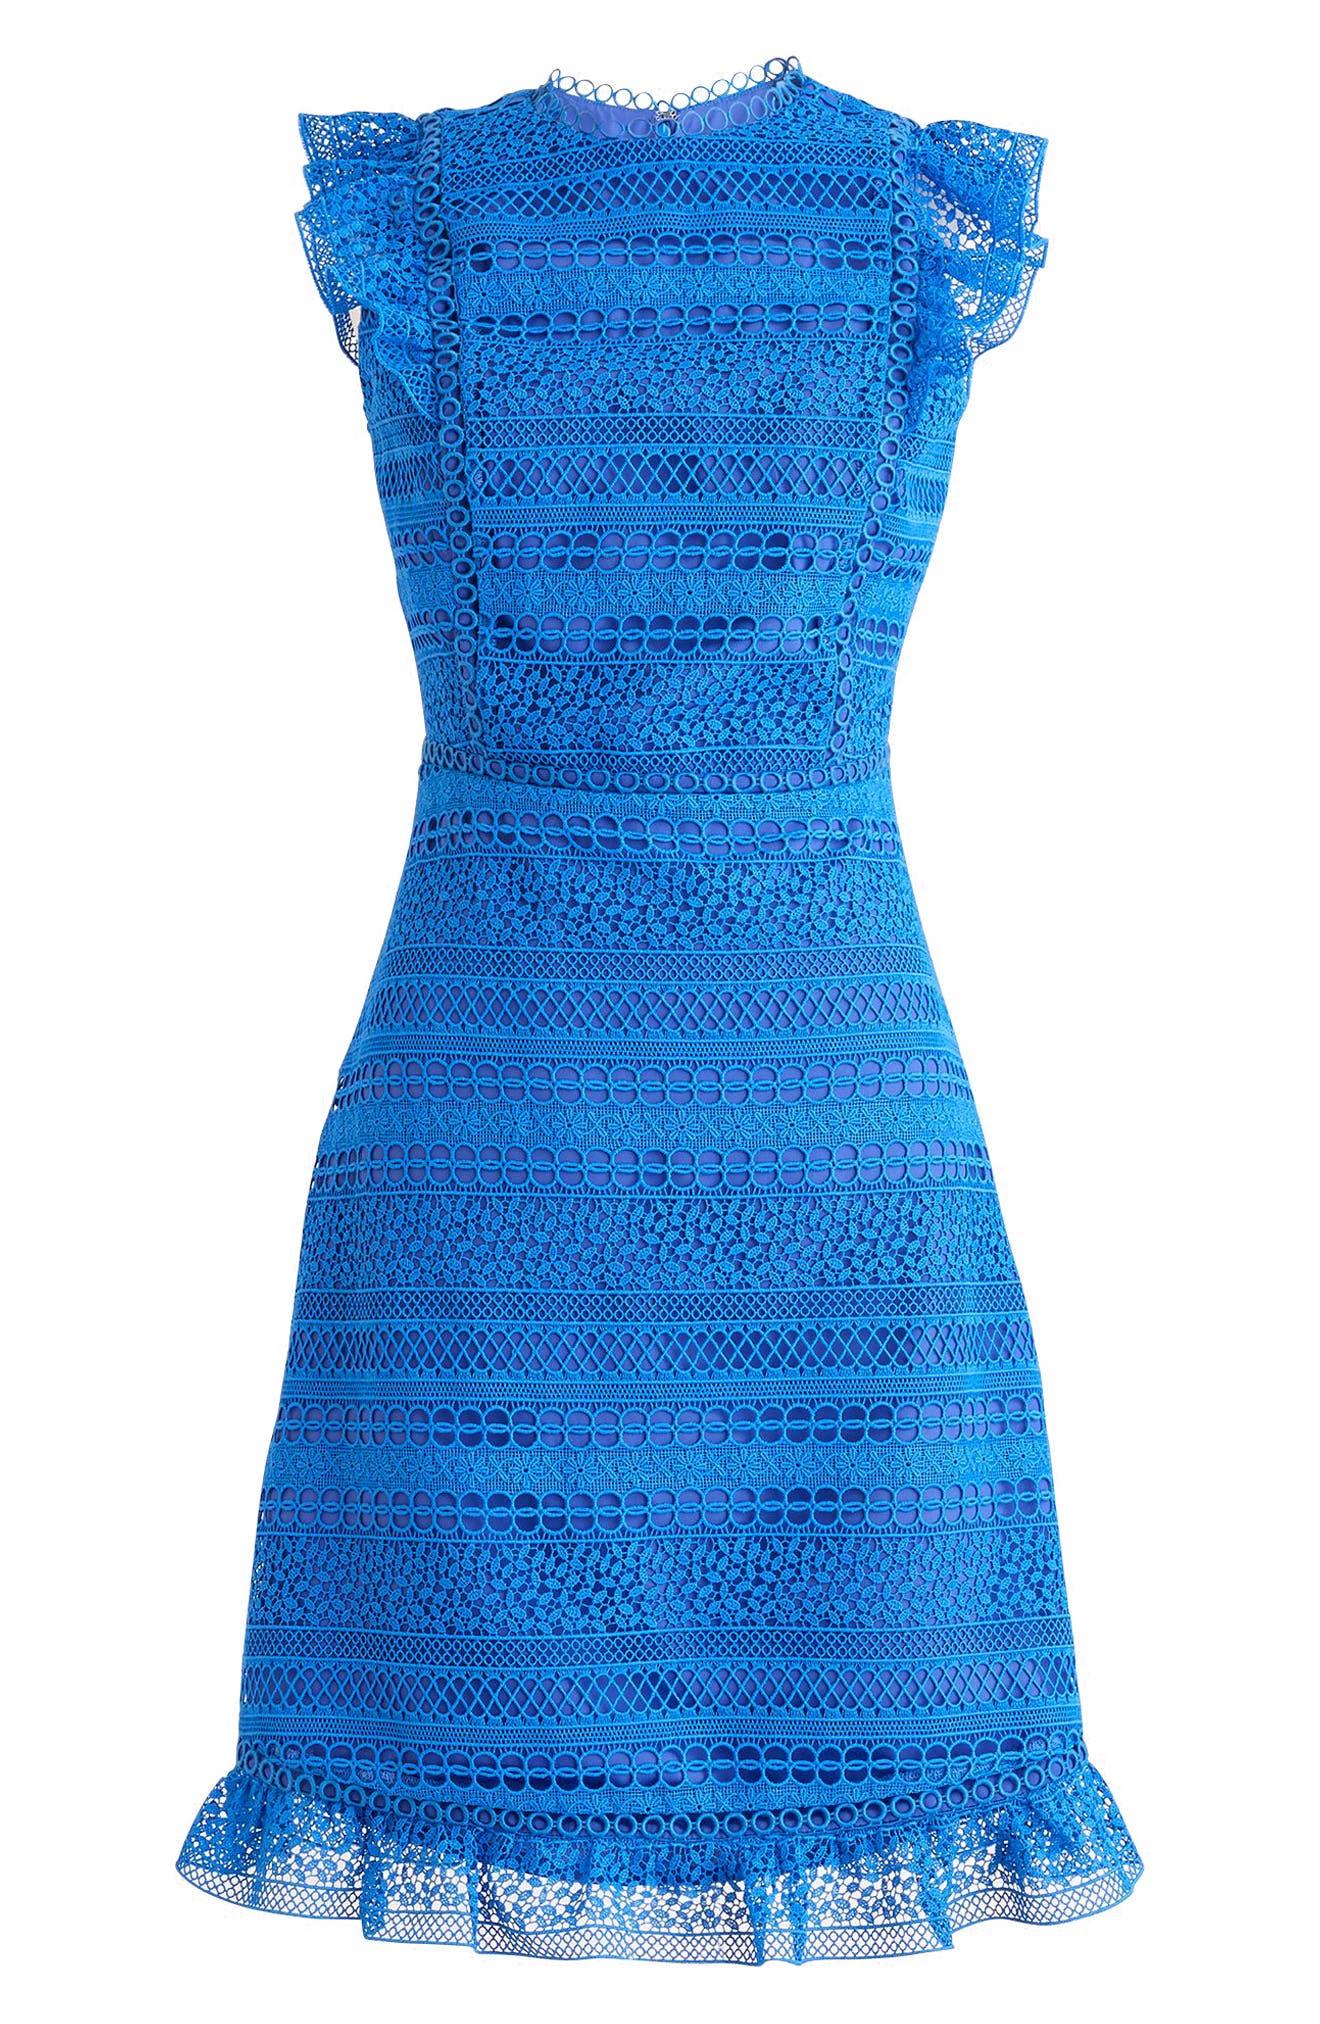 J.Crew Cap Sleeve Ruffle Lace Dress,                         Main,                         color, Mediterranean Coast